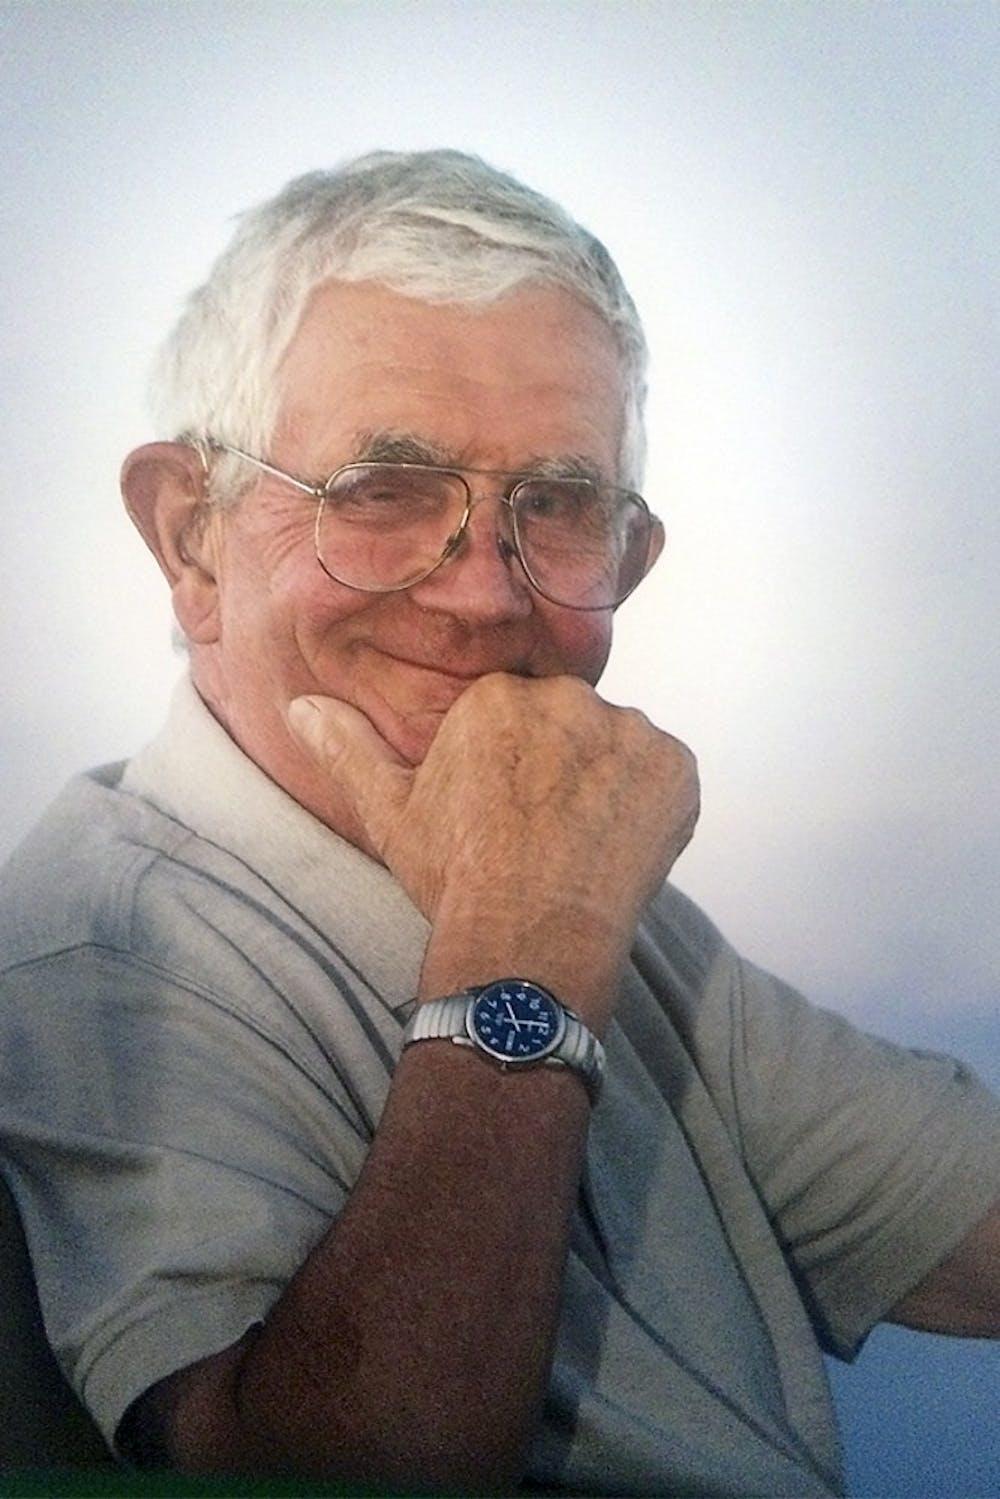 'Farmer Bob' Nutter, founder of Maple View Farm, dies at 90